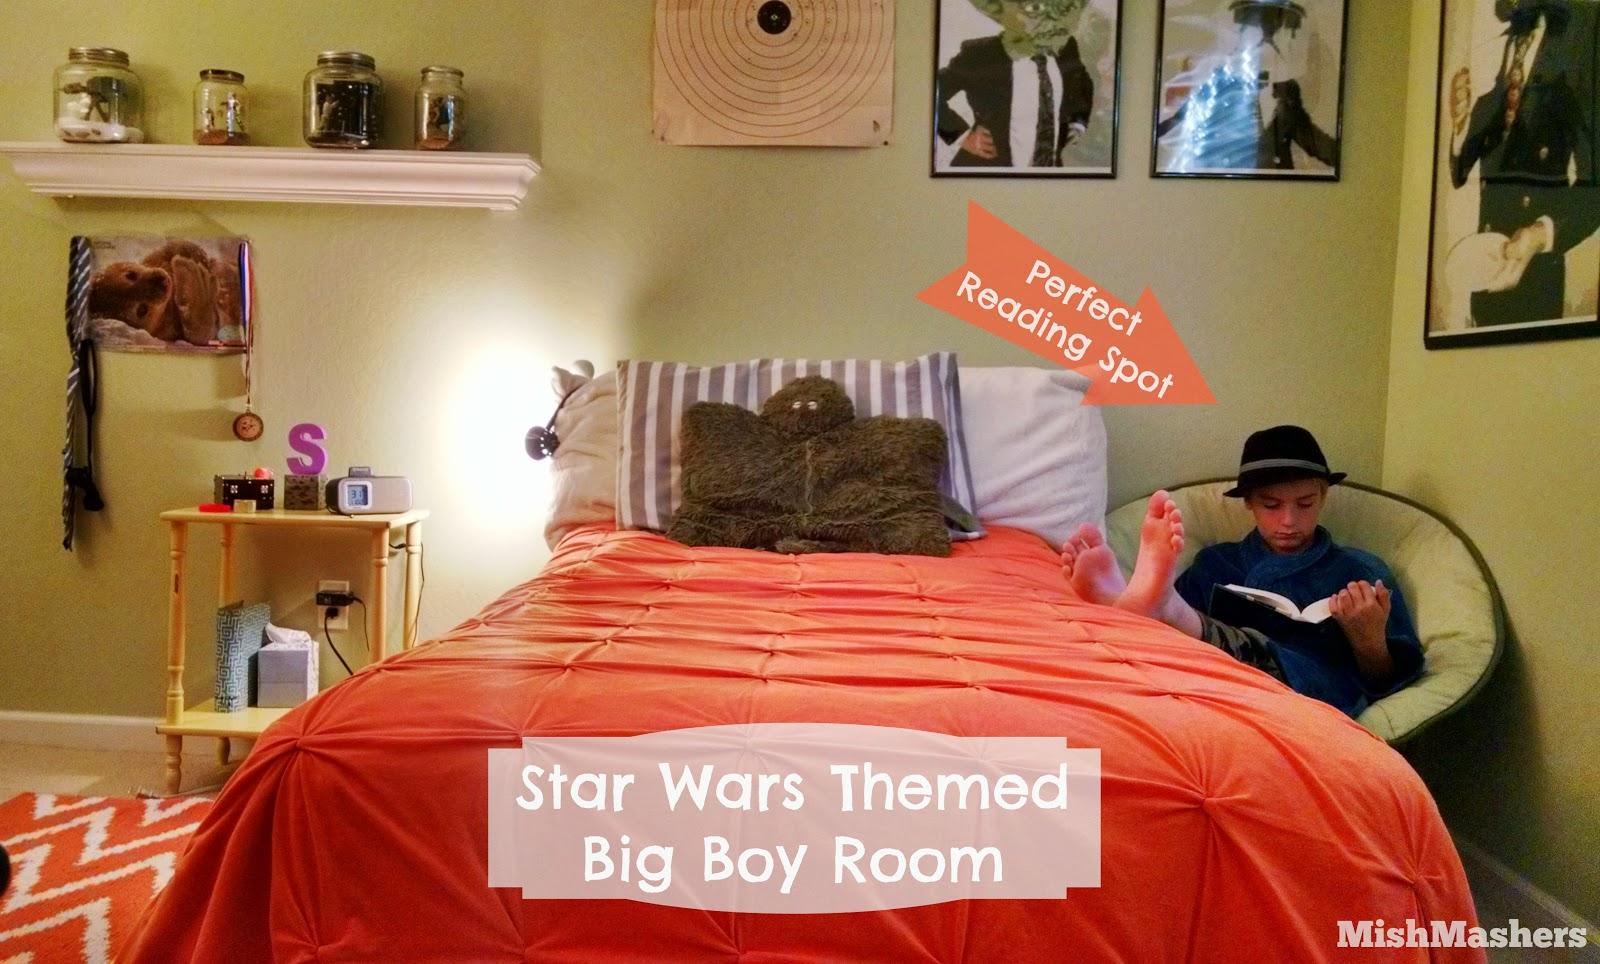 mishmashers star wars bedroom